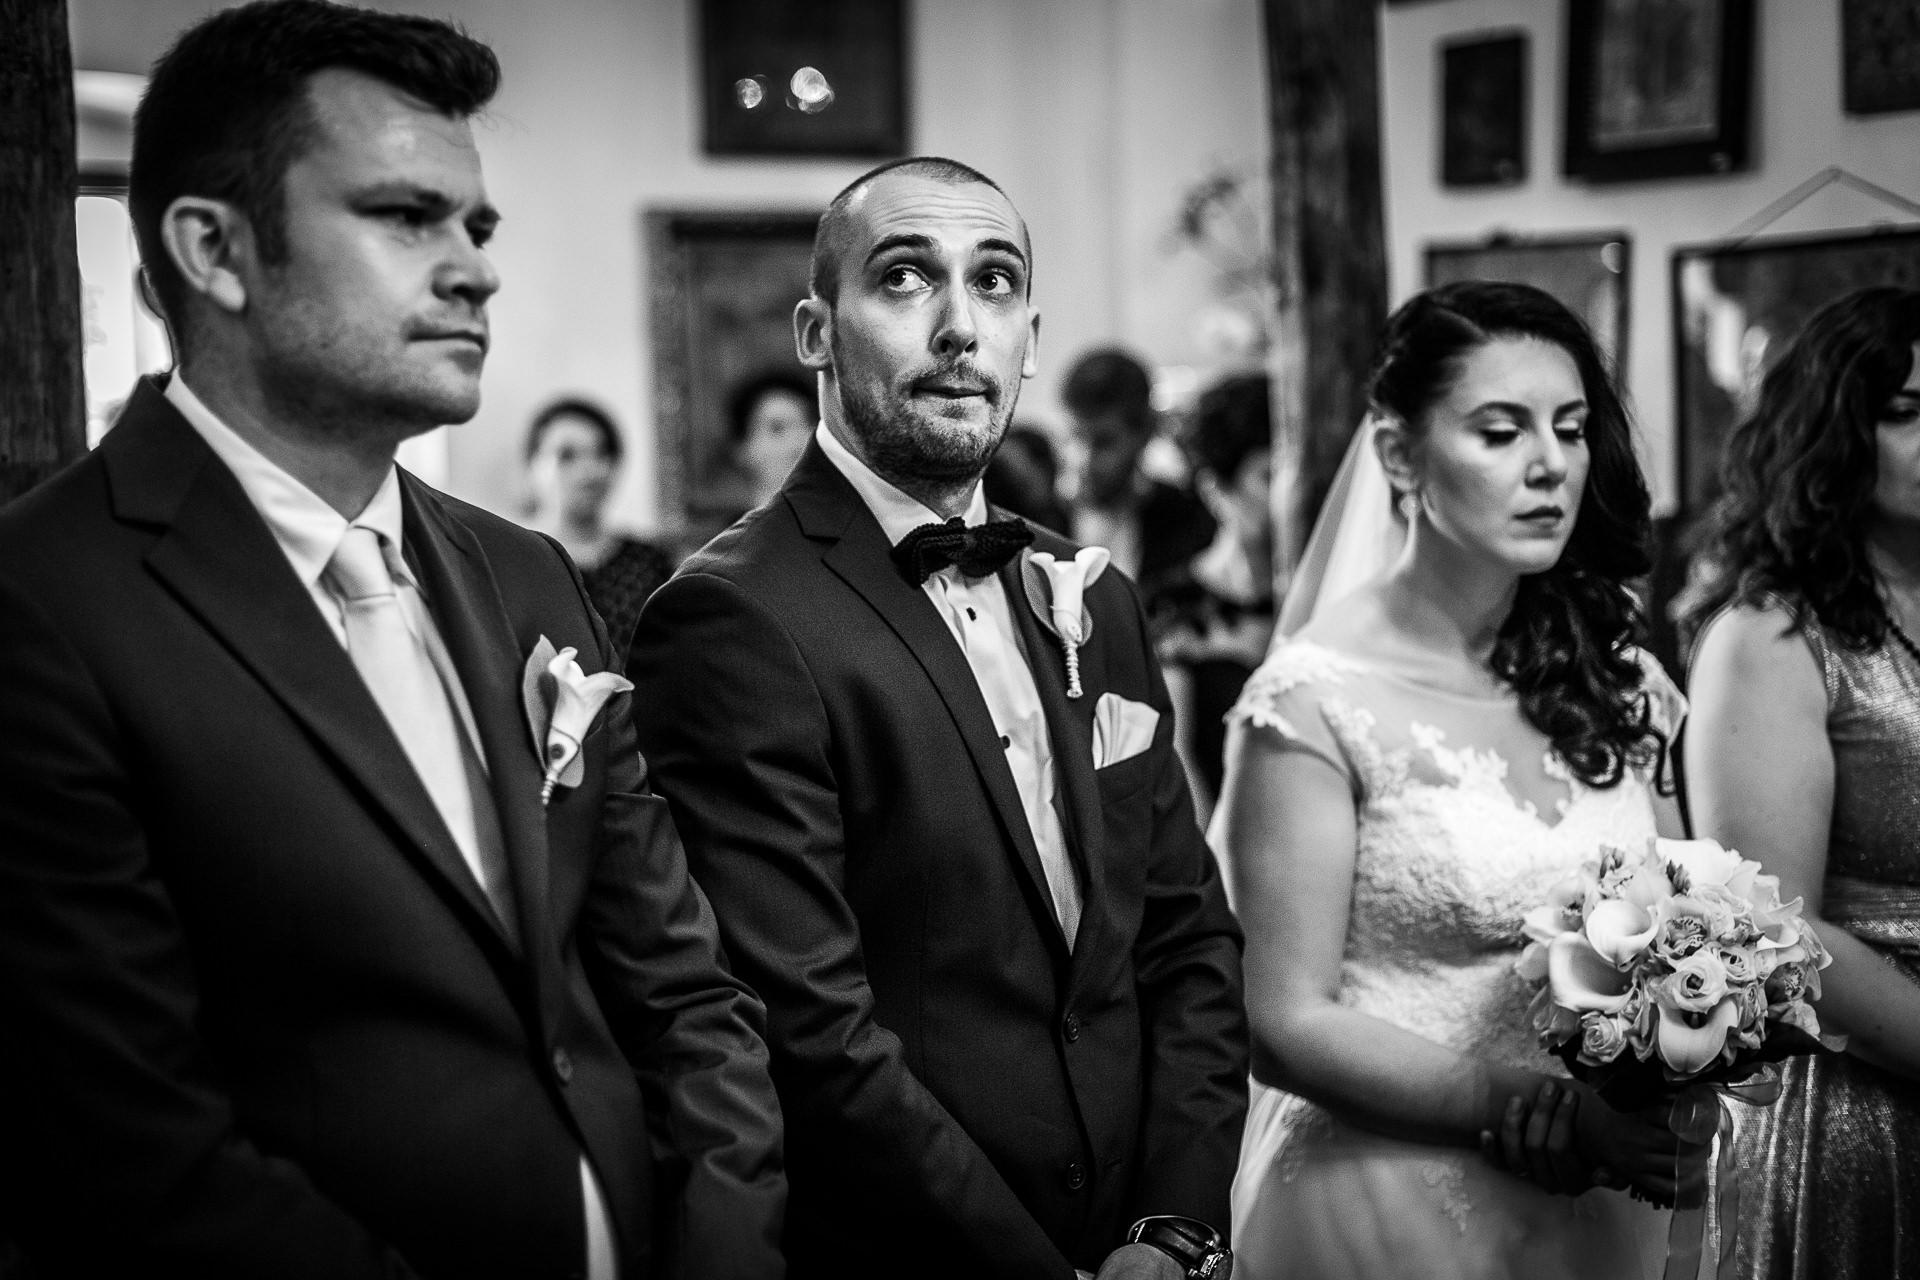 Fotografie de nunta ceremonie religioasa Biserica Bucur Ciobanul Bucuresti | Alina si Razvan | 04